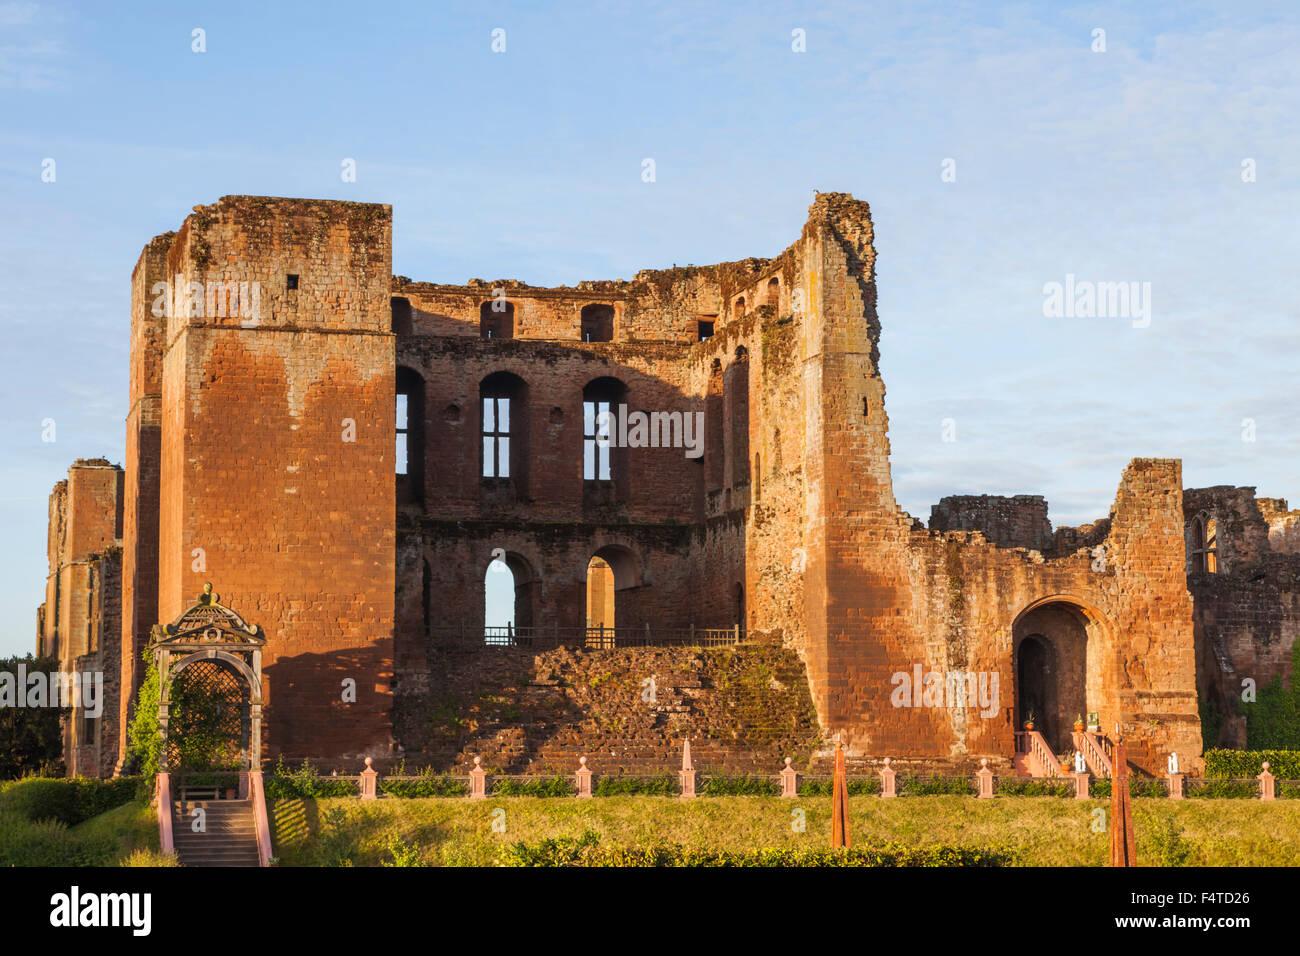 England, Warwickshire, Kenilworth, Kenilworth Castle - Stock Image